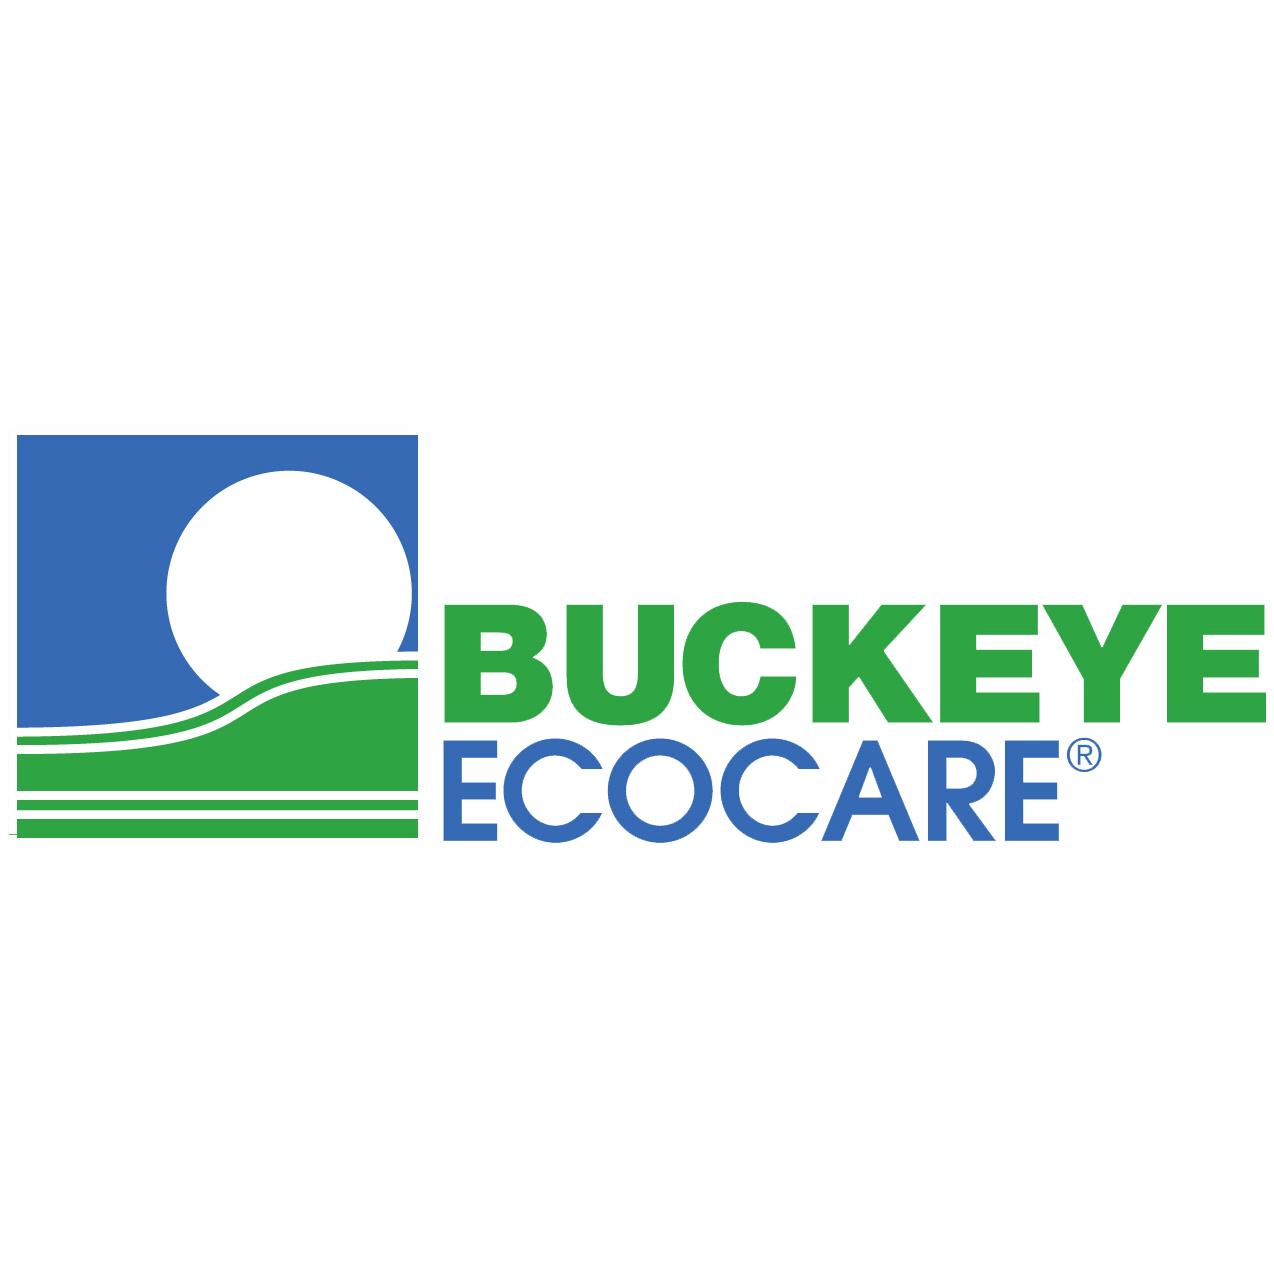 Buckeye Ecocare Miamisburg Ohio Oh Localdatabase Com